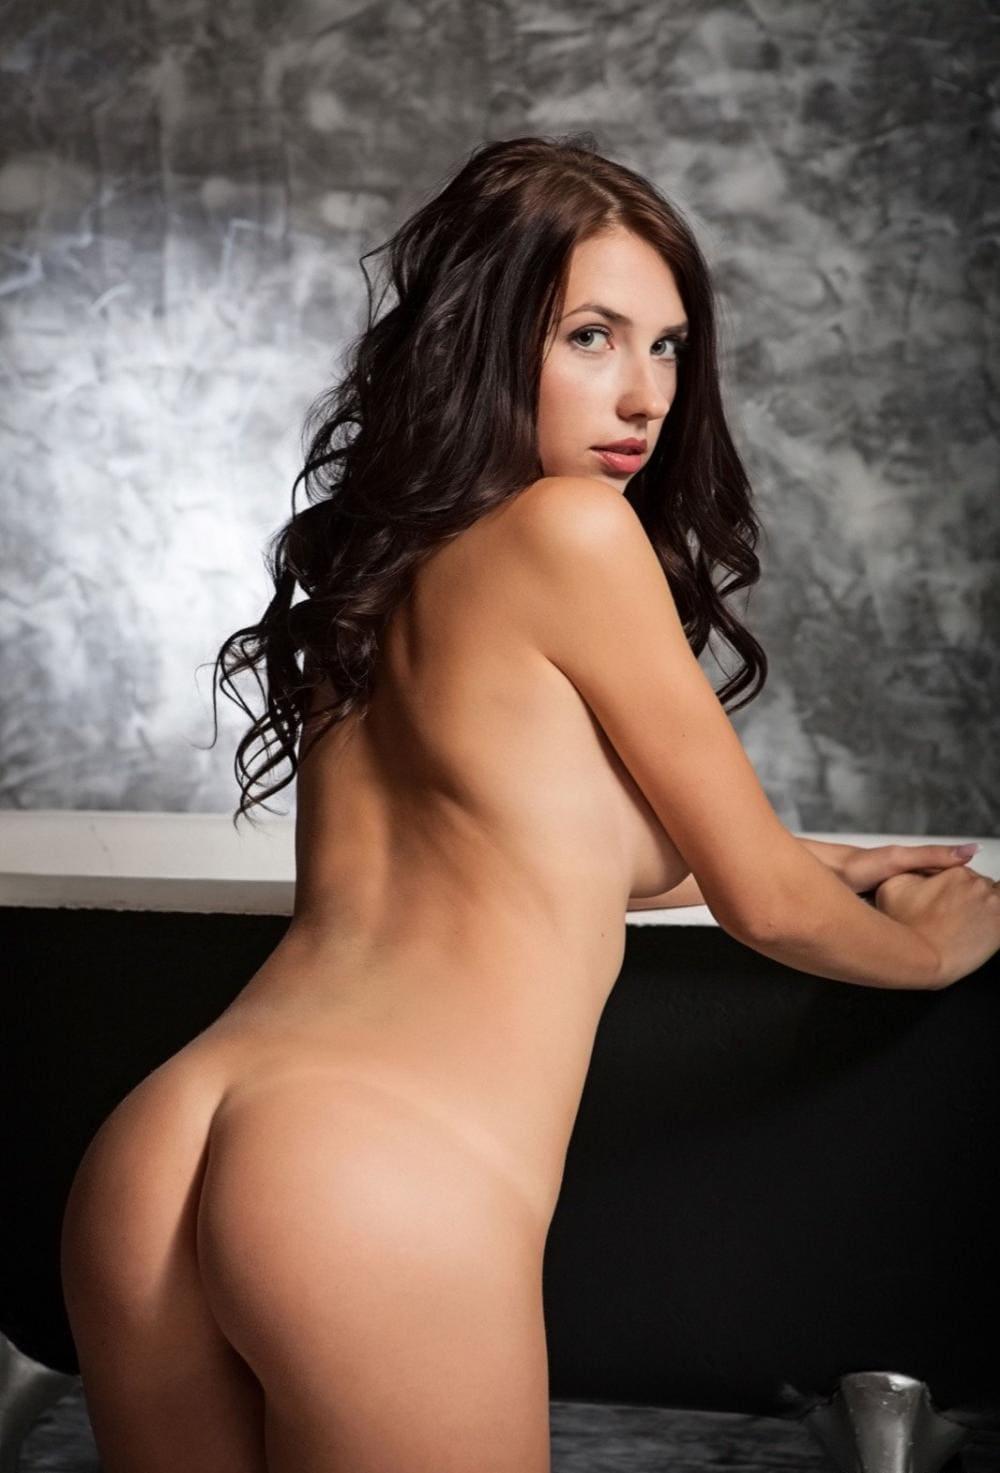 Голая попа брюнетки стоит возле стойки руки на нее положила, вид сзади